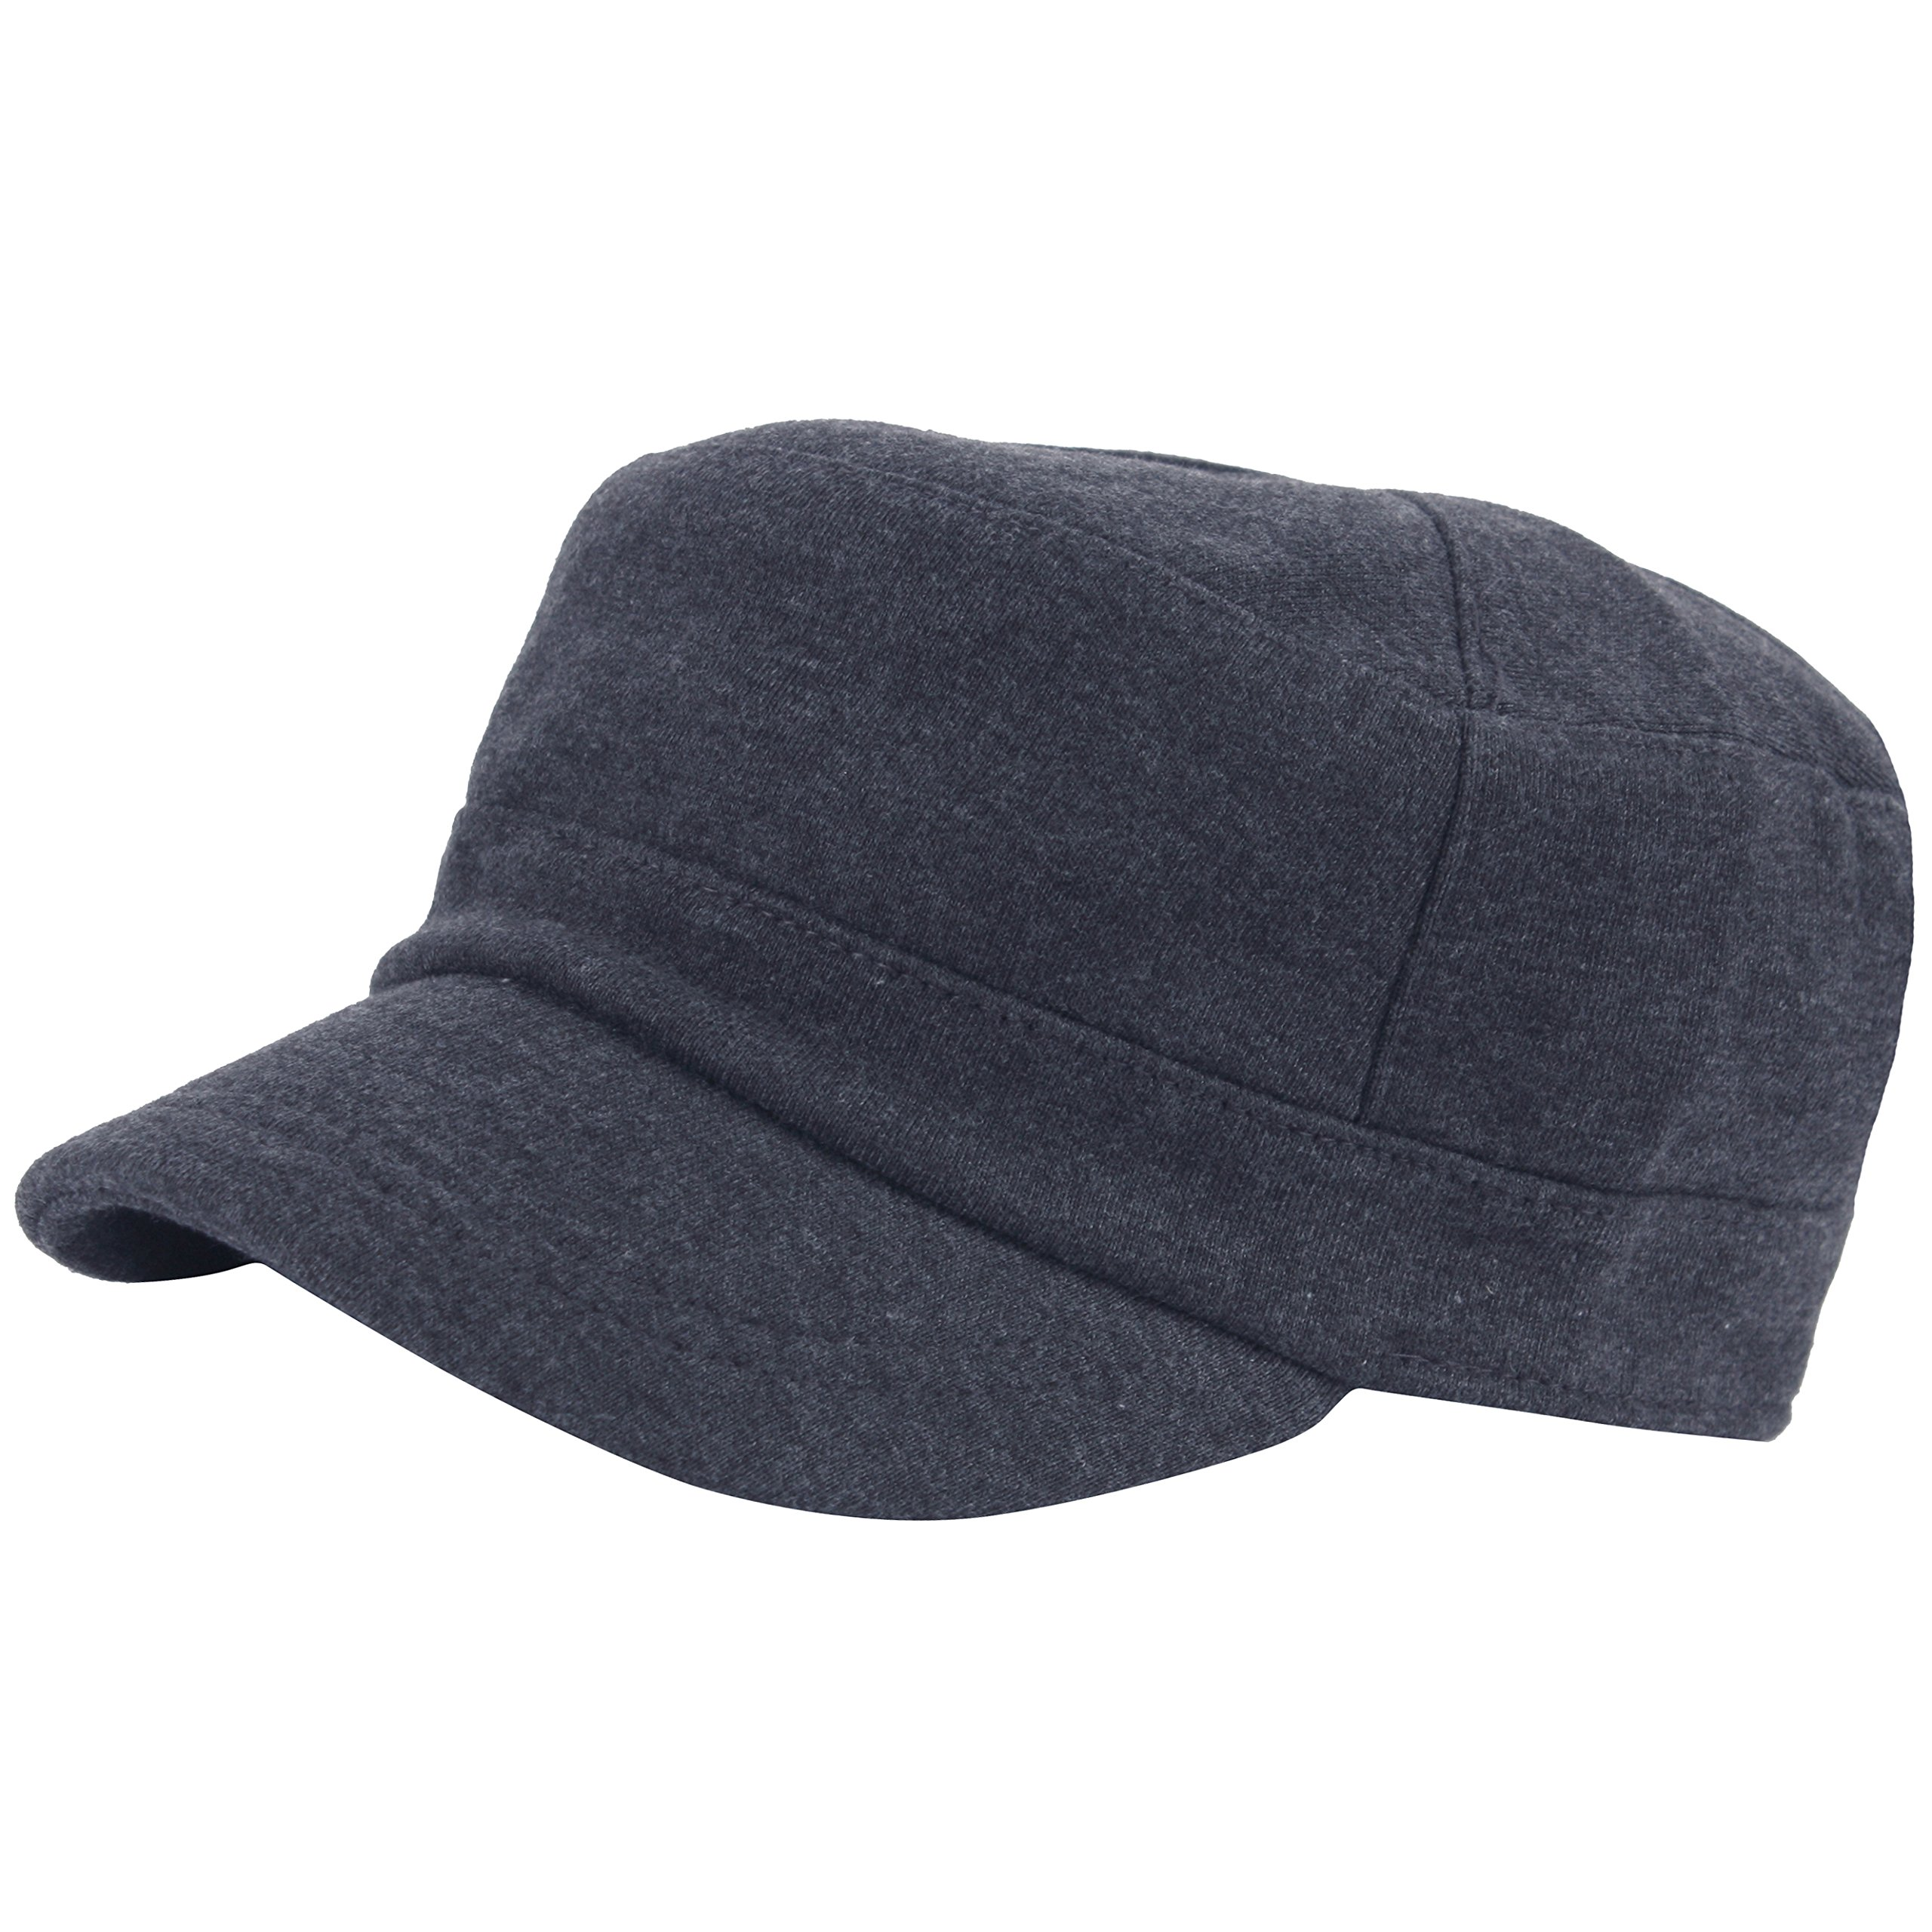 RaOn A206 New Comfortable Thick Cotton Short Bill Army Cap Golf Club Cadet Military (Darkgray)